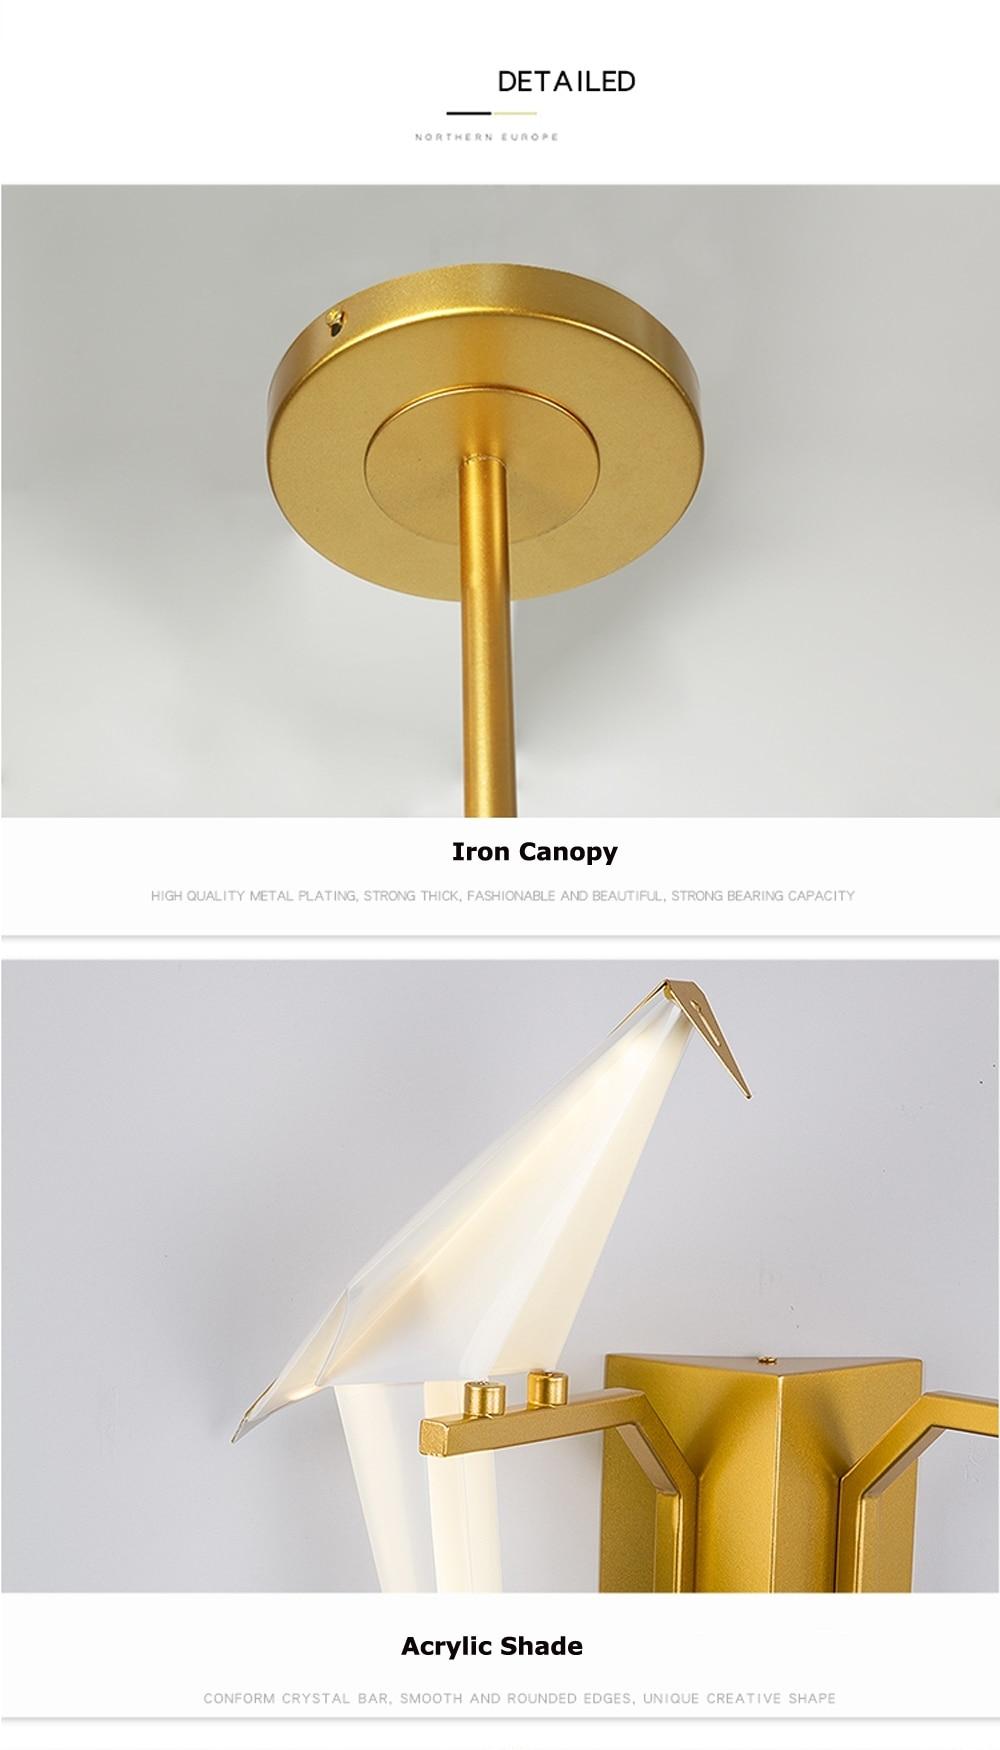 H3dc23b591b8649eeaedc68b05681e70eD - LED Postmodern Iron Acryl Love Bird LED Lamp LED Light Wall lamp Wall Light Wall Sconce For Bedroom Corridor